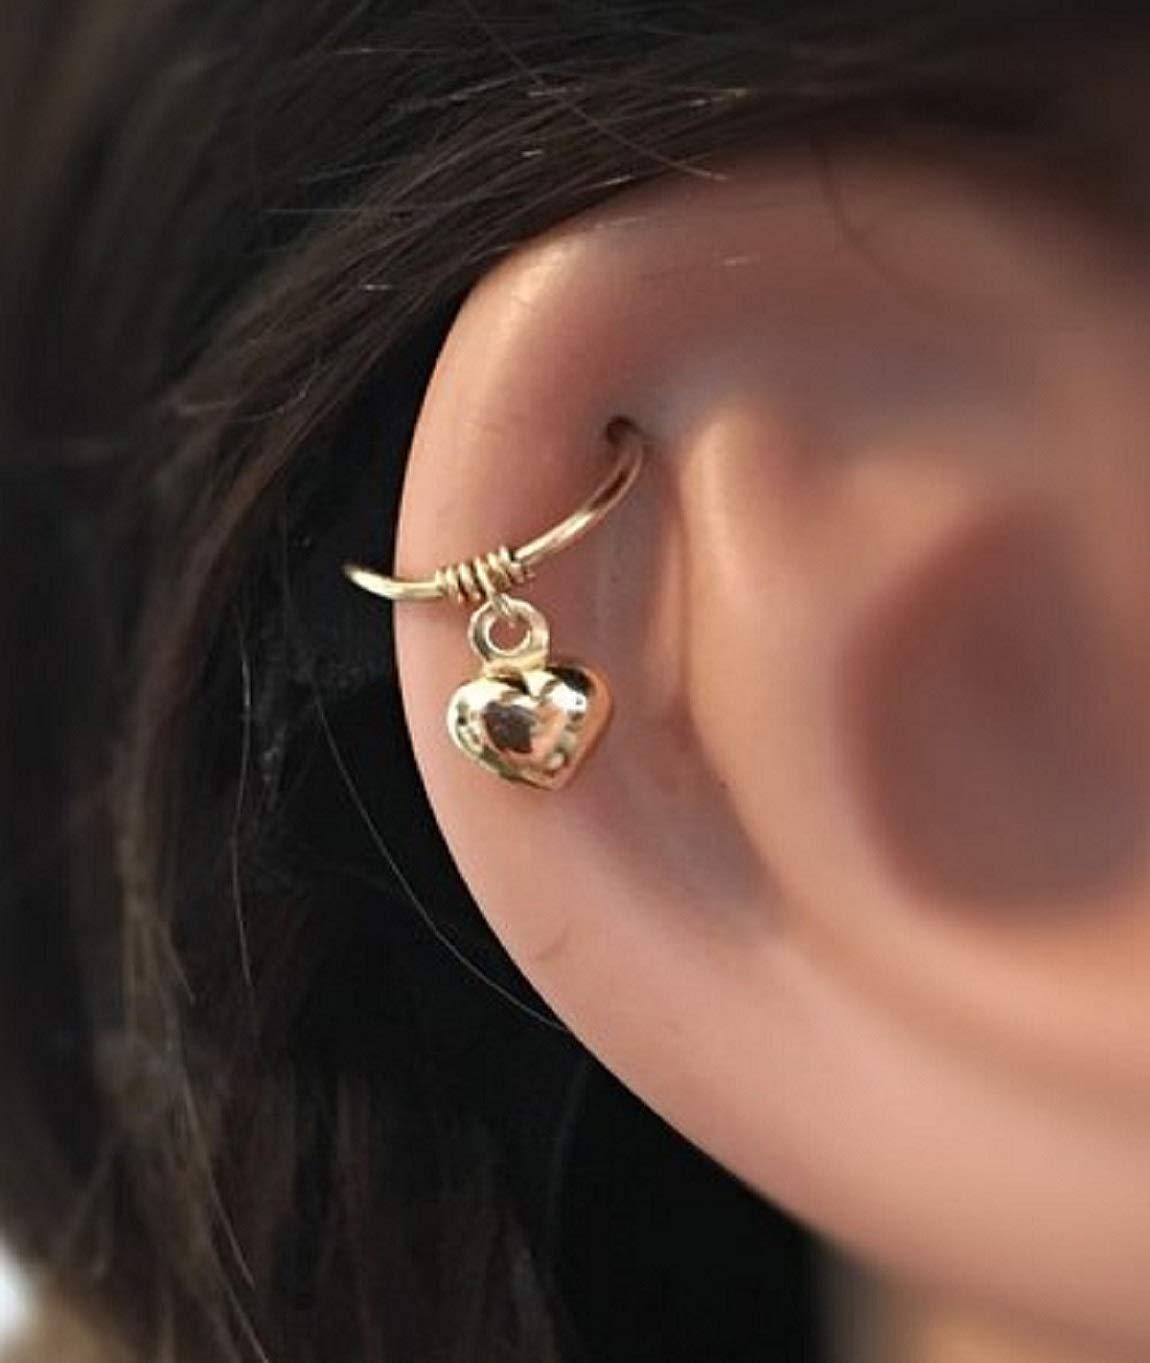 66caf657c Amazon.com: Heart Cartilage Earring 14K Gold Helix Ring Tragus Hoop:  Handmade